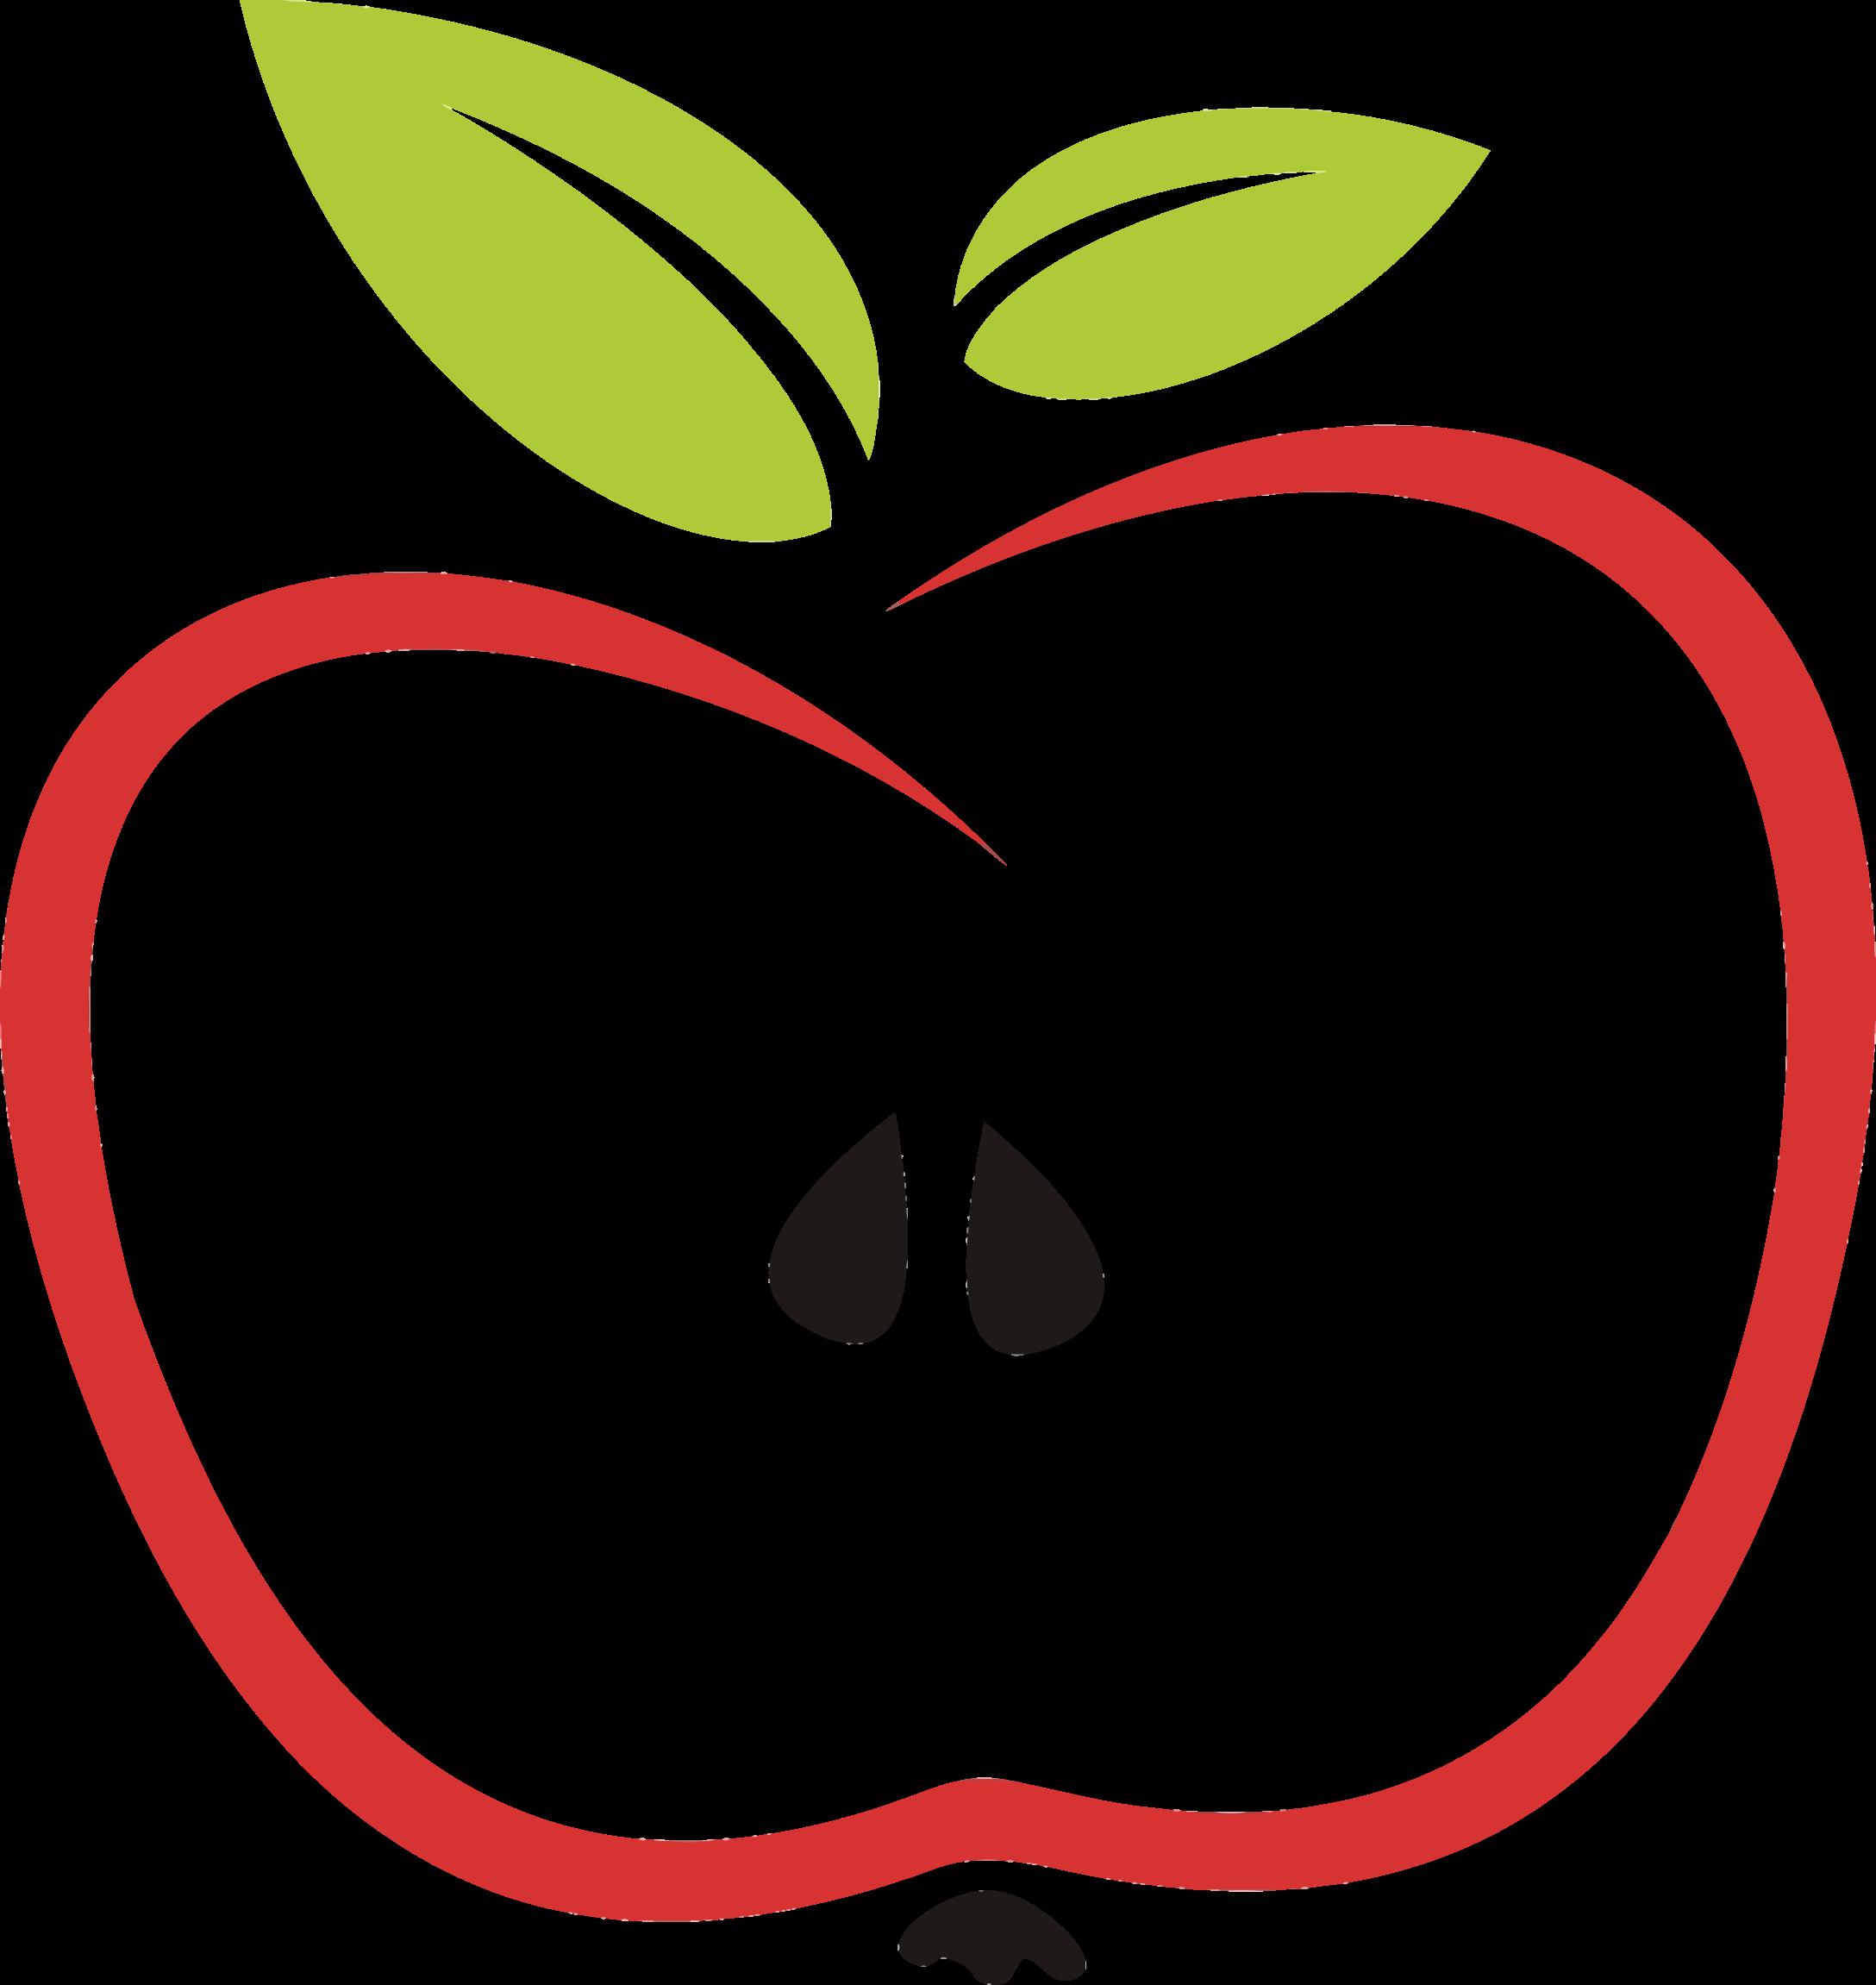 Leaf of apple jokingart. D20 clipart stylized